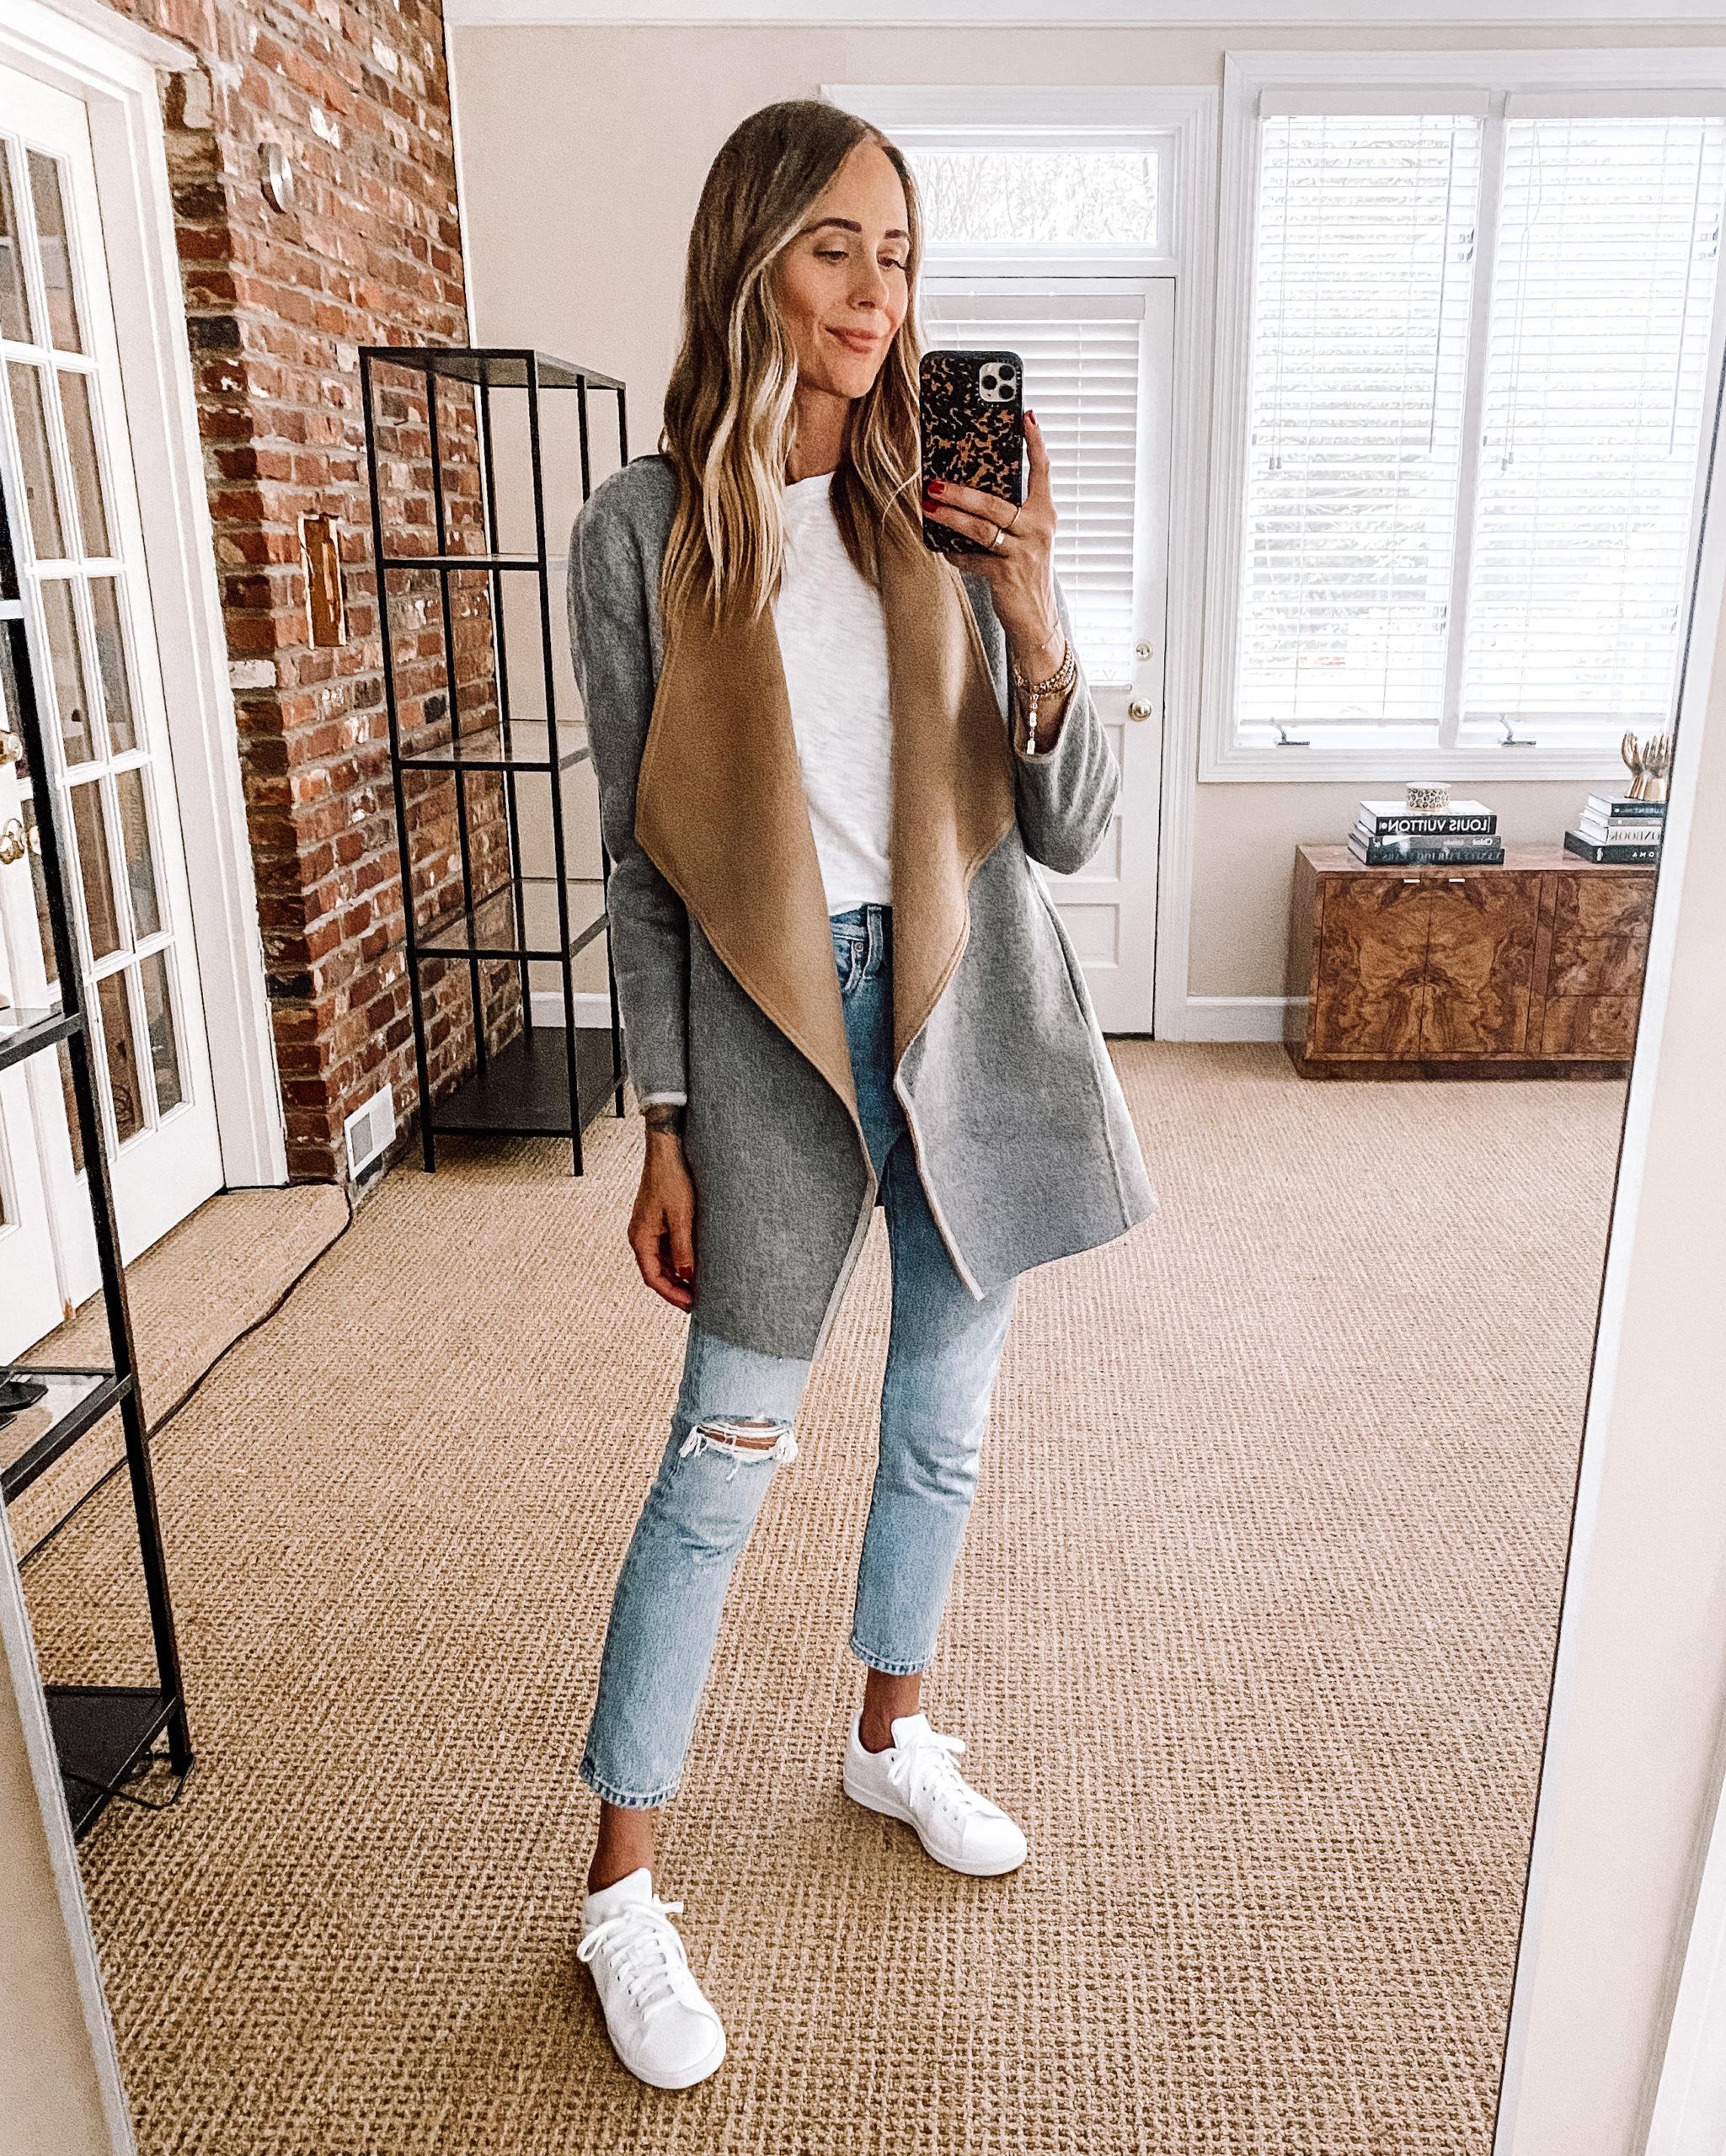 Fashion Jackson Nordstrom Anniversary Sale Reversible Jacket White Tshirt White Ripped Jeans